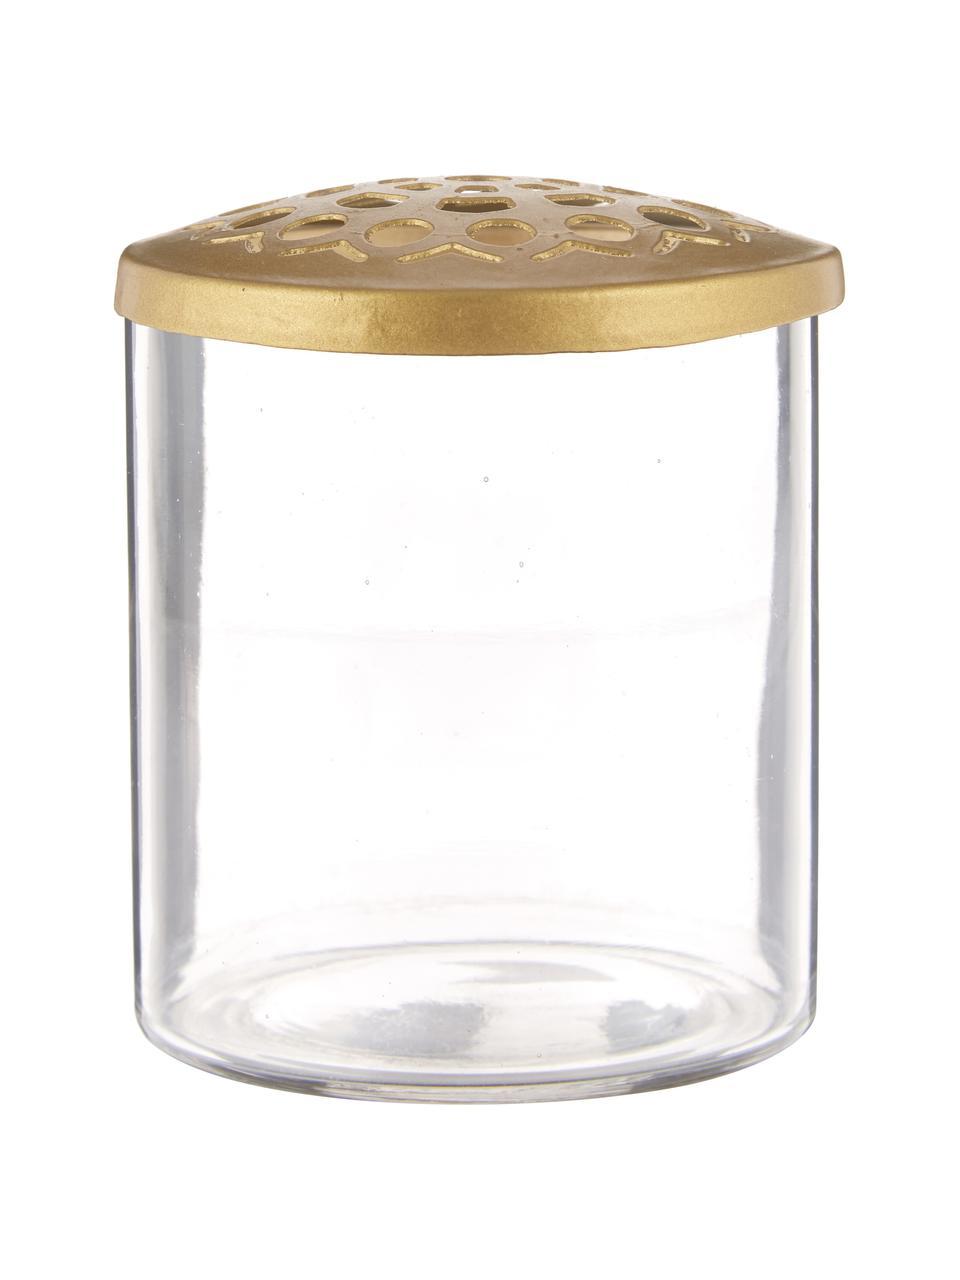 XS vazenset Kastanje met metalen deksel, 2-delig, Vaas: glas, Deksel: vermessingd edelstaal met, Vaas: transparant. Deksel: messingkleurig, Set met verschillende formaten